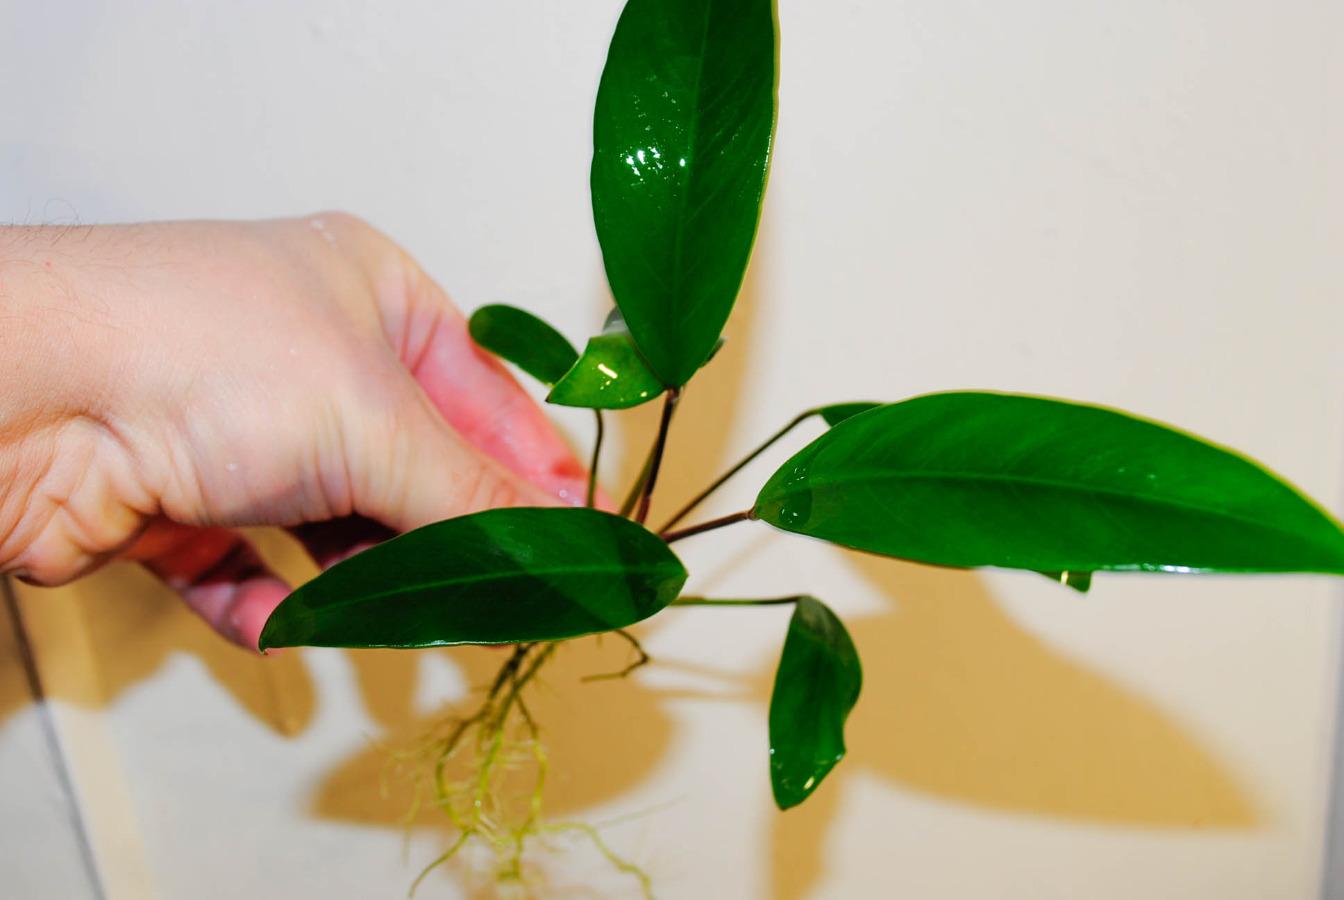 Цветок эпипремнум: фото и уход в домашних условиях. Эпипремнум золотистый, Эпипремнум марбл квин, Эпипремнум ауреум